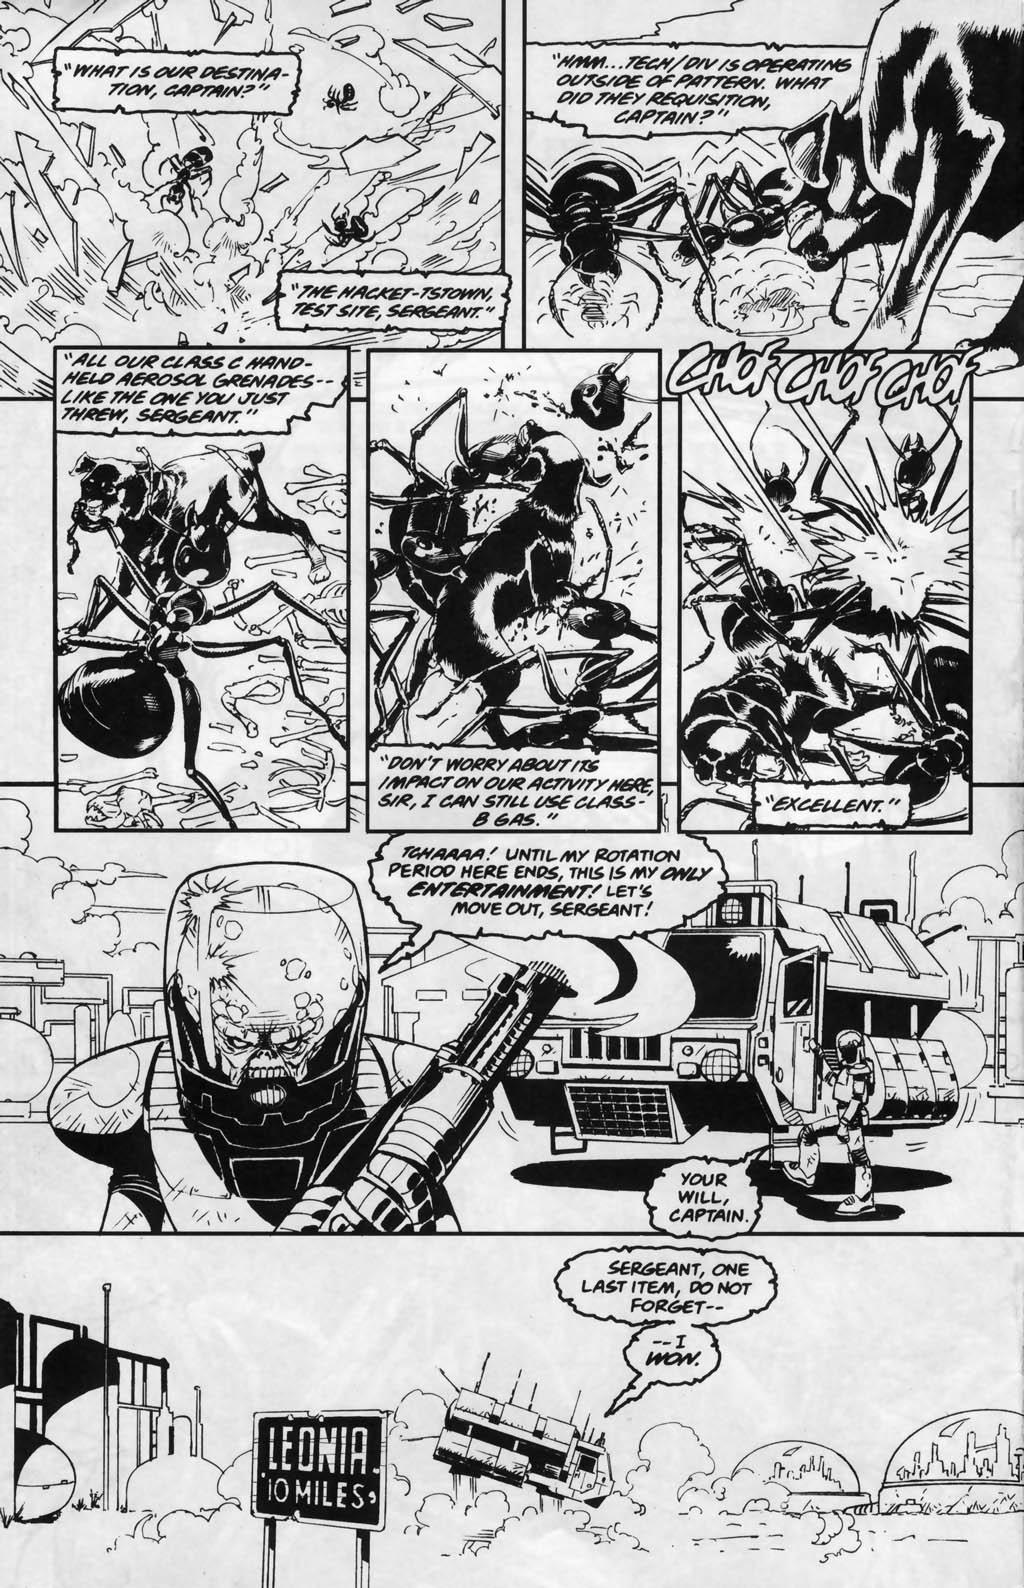 Topps Marvel recueillir TOPPS collectionneurs réserve Thanos Motion Digital Card RARE